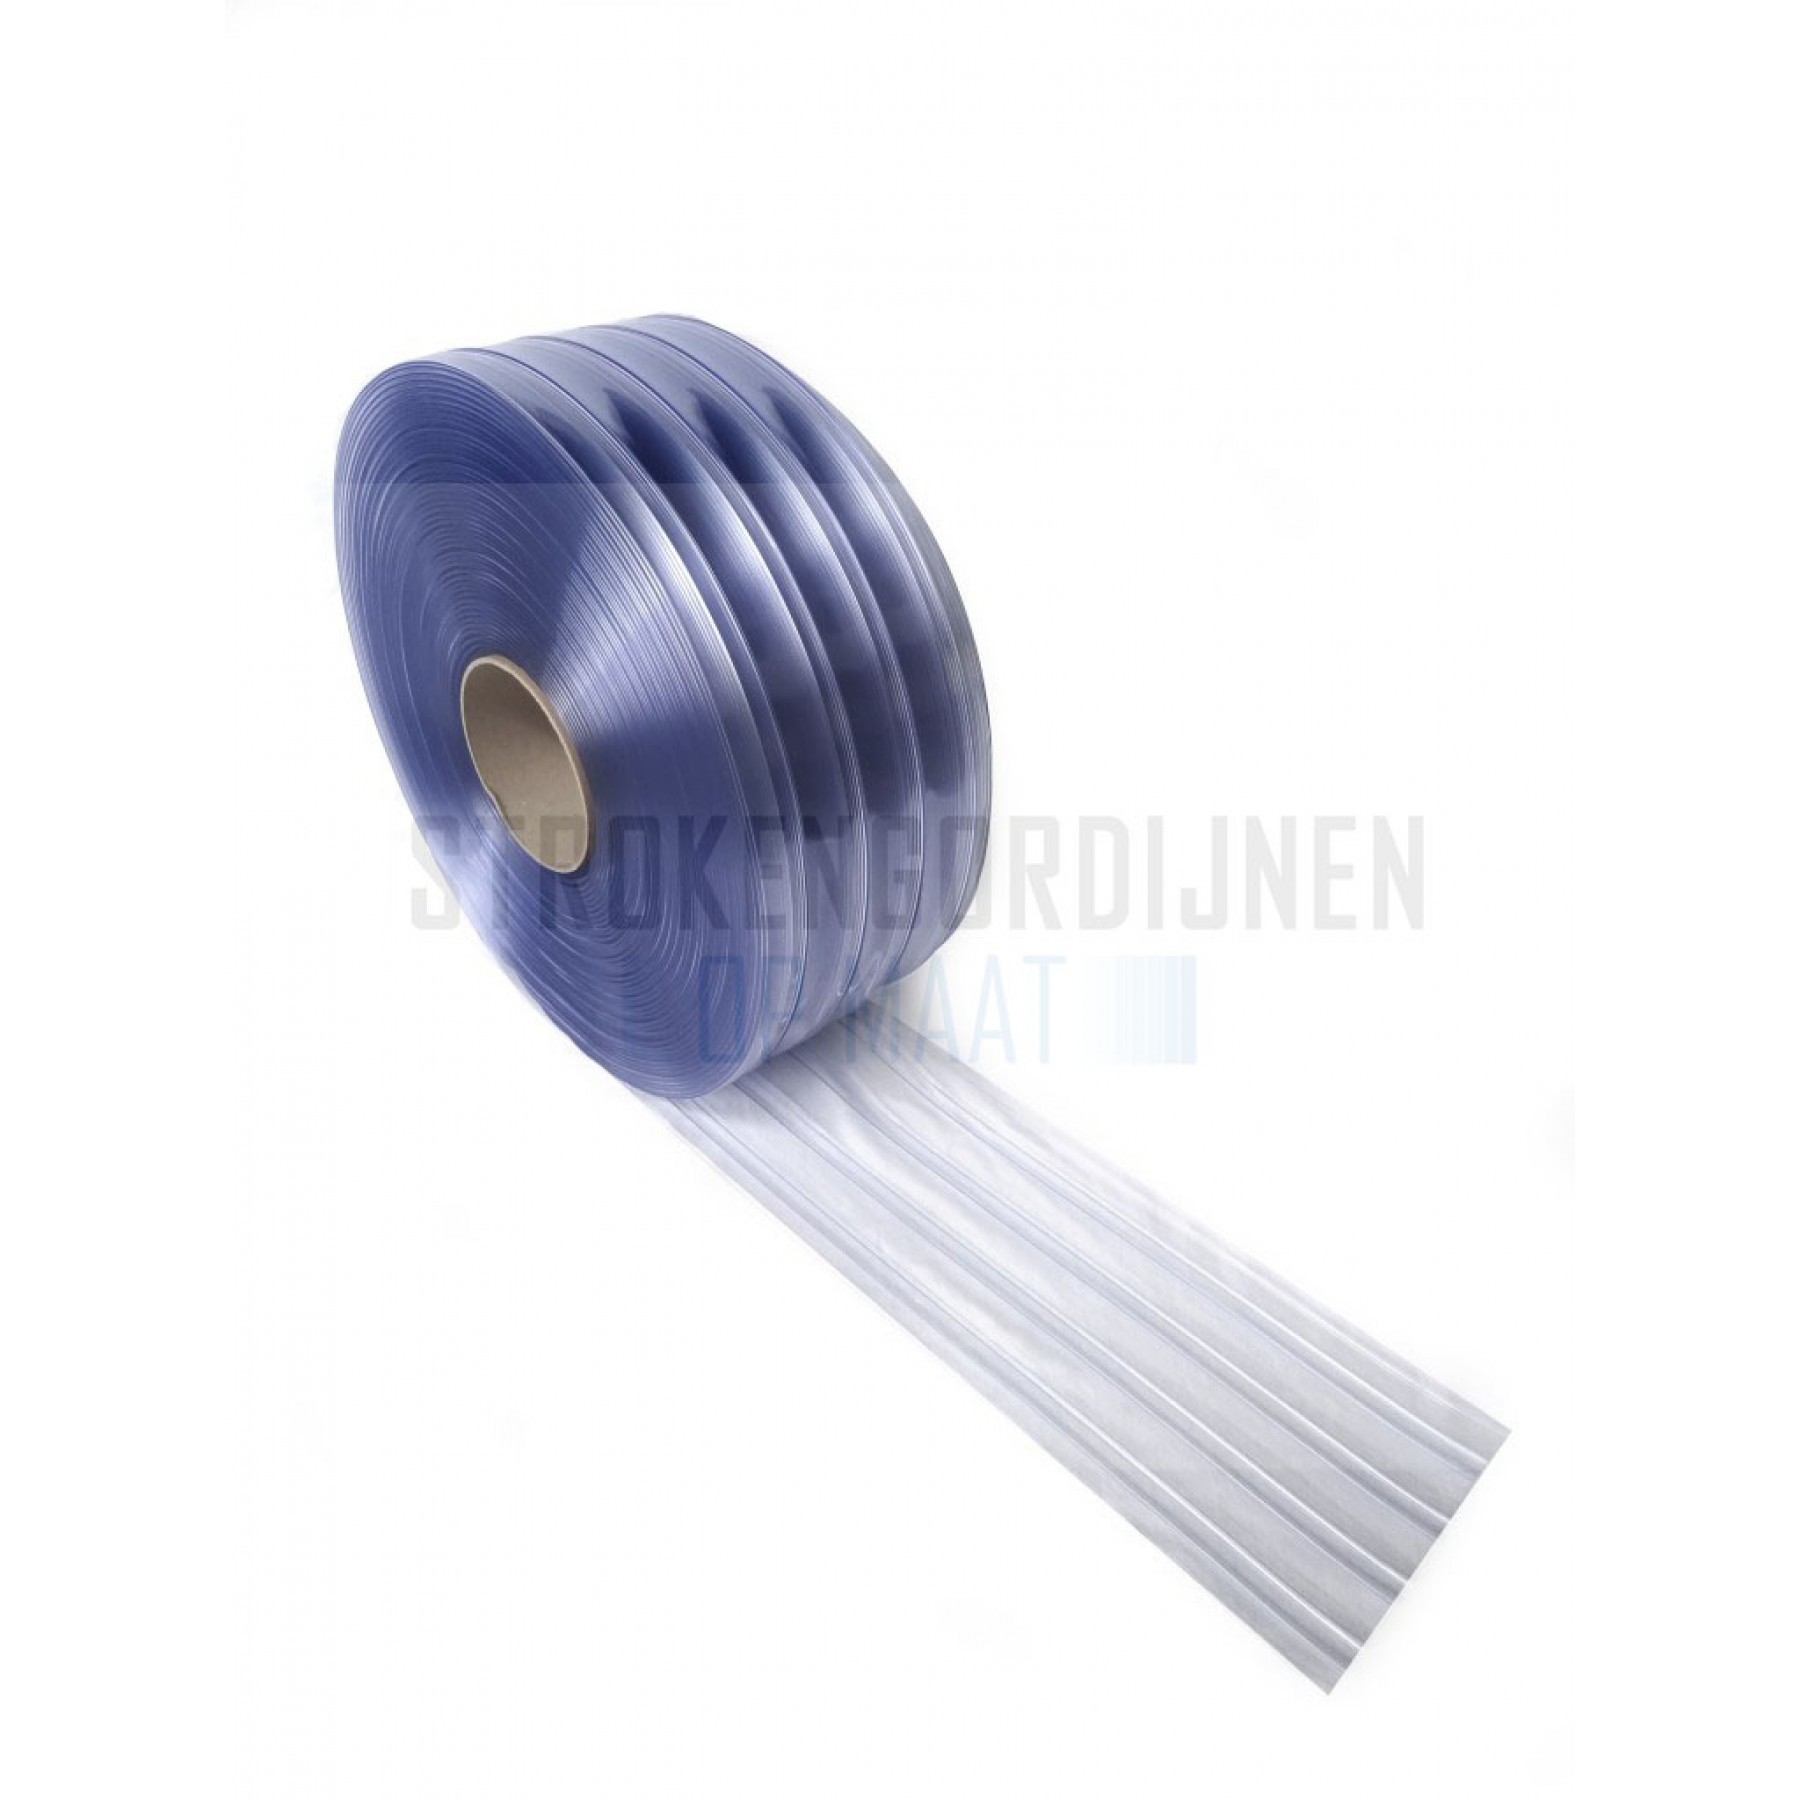 PVC Ribbed Rolle, 300mm breit, 3mm dick, 50 Meter lang, transparent